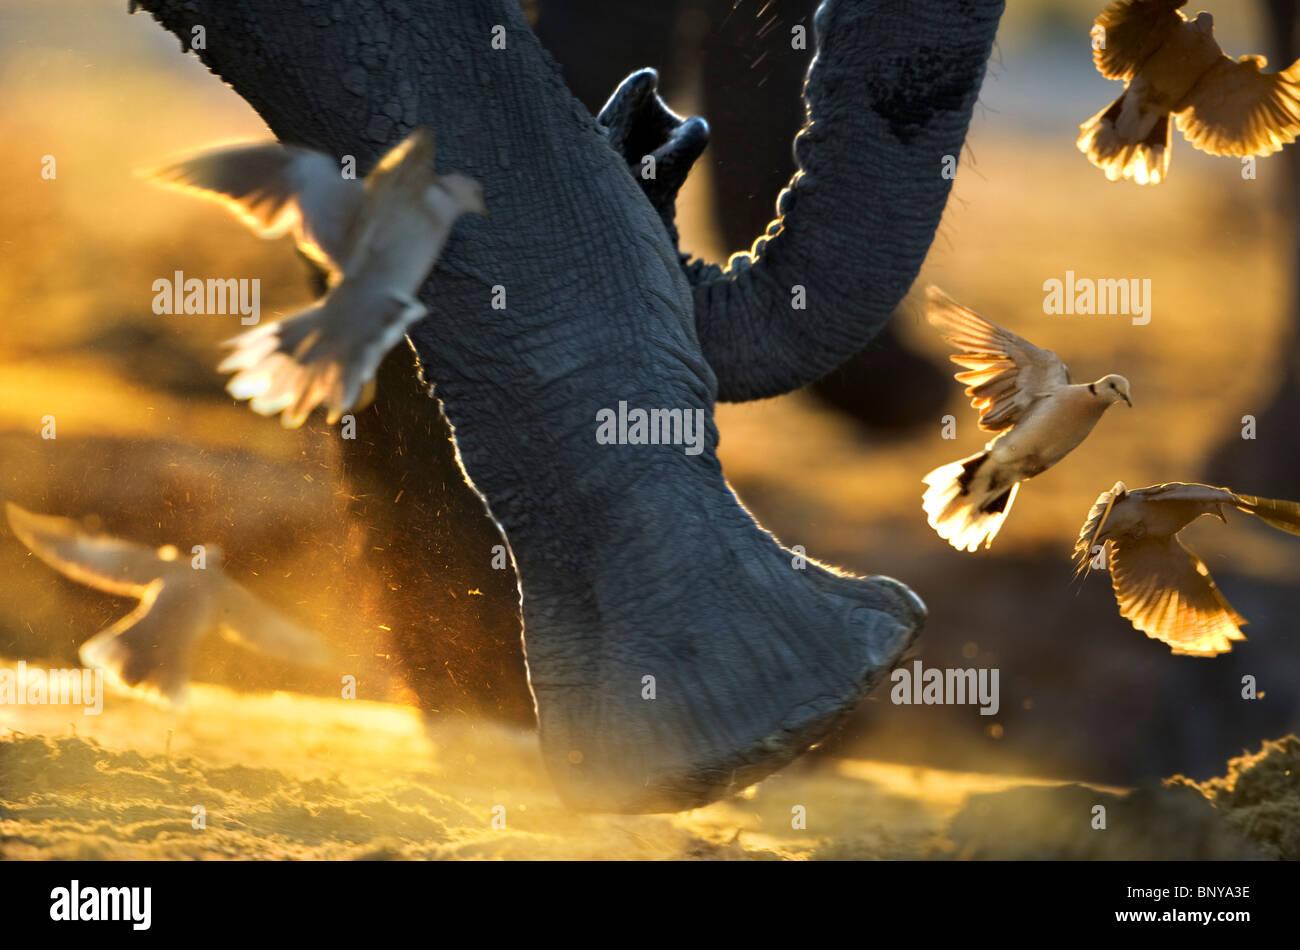 Cerca del elefante 's pies inquietante Cape tórtolas. Savuti ,Botswana. Imagen De Stock